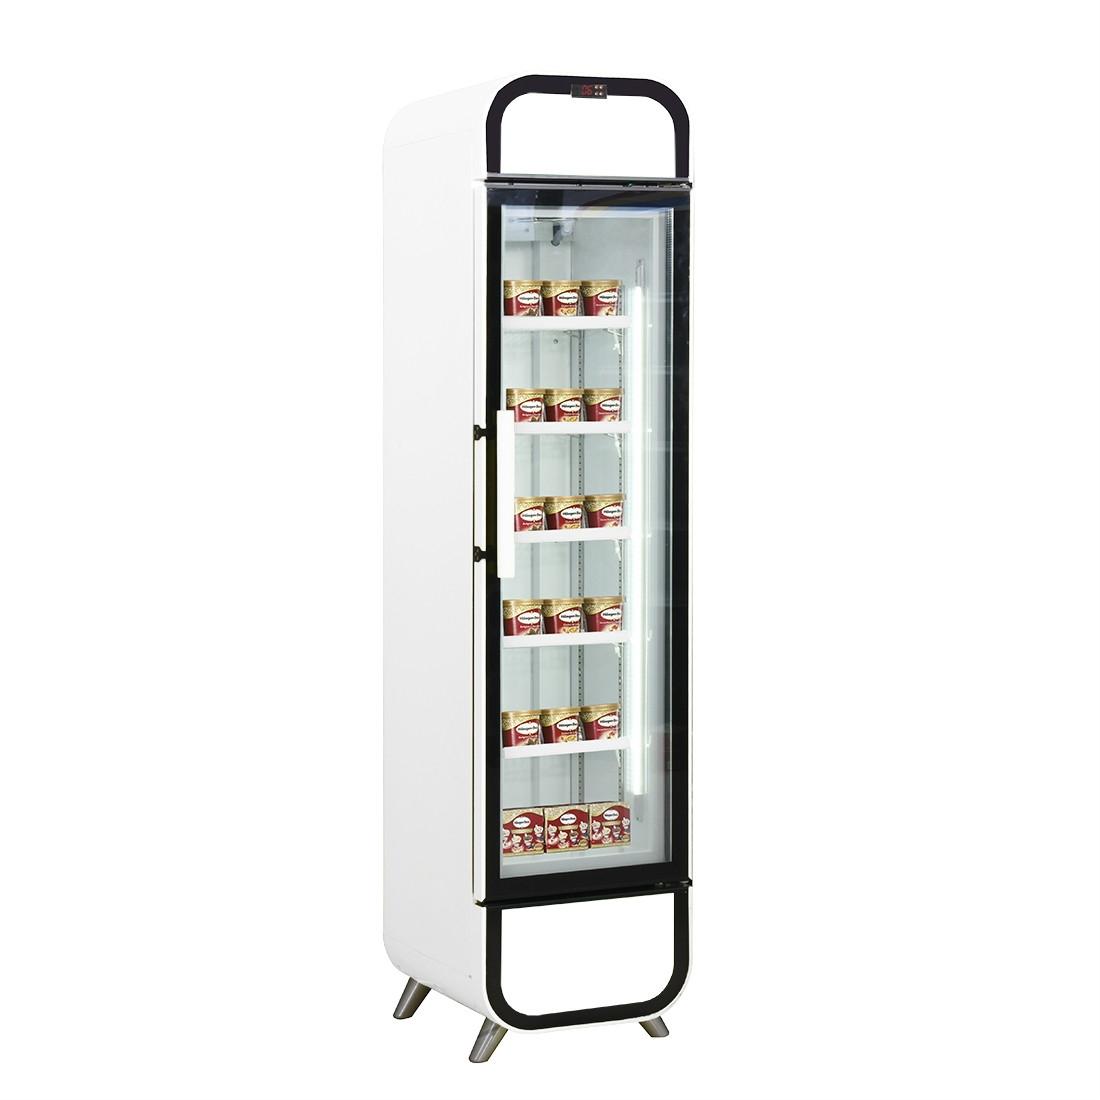 LG-180GEF Single glass door colourbond upright freezer